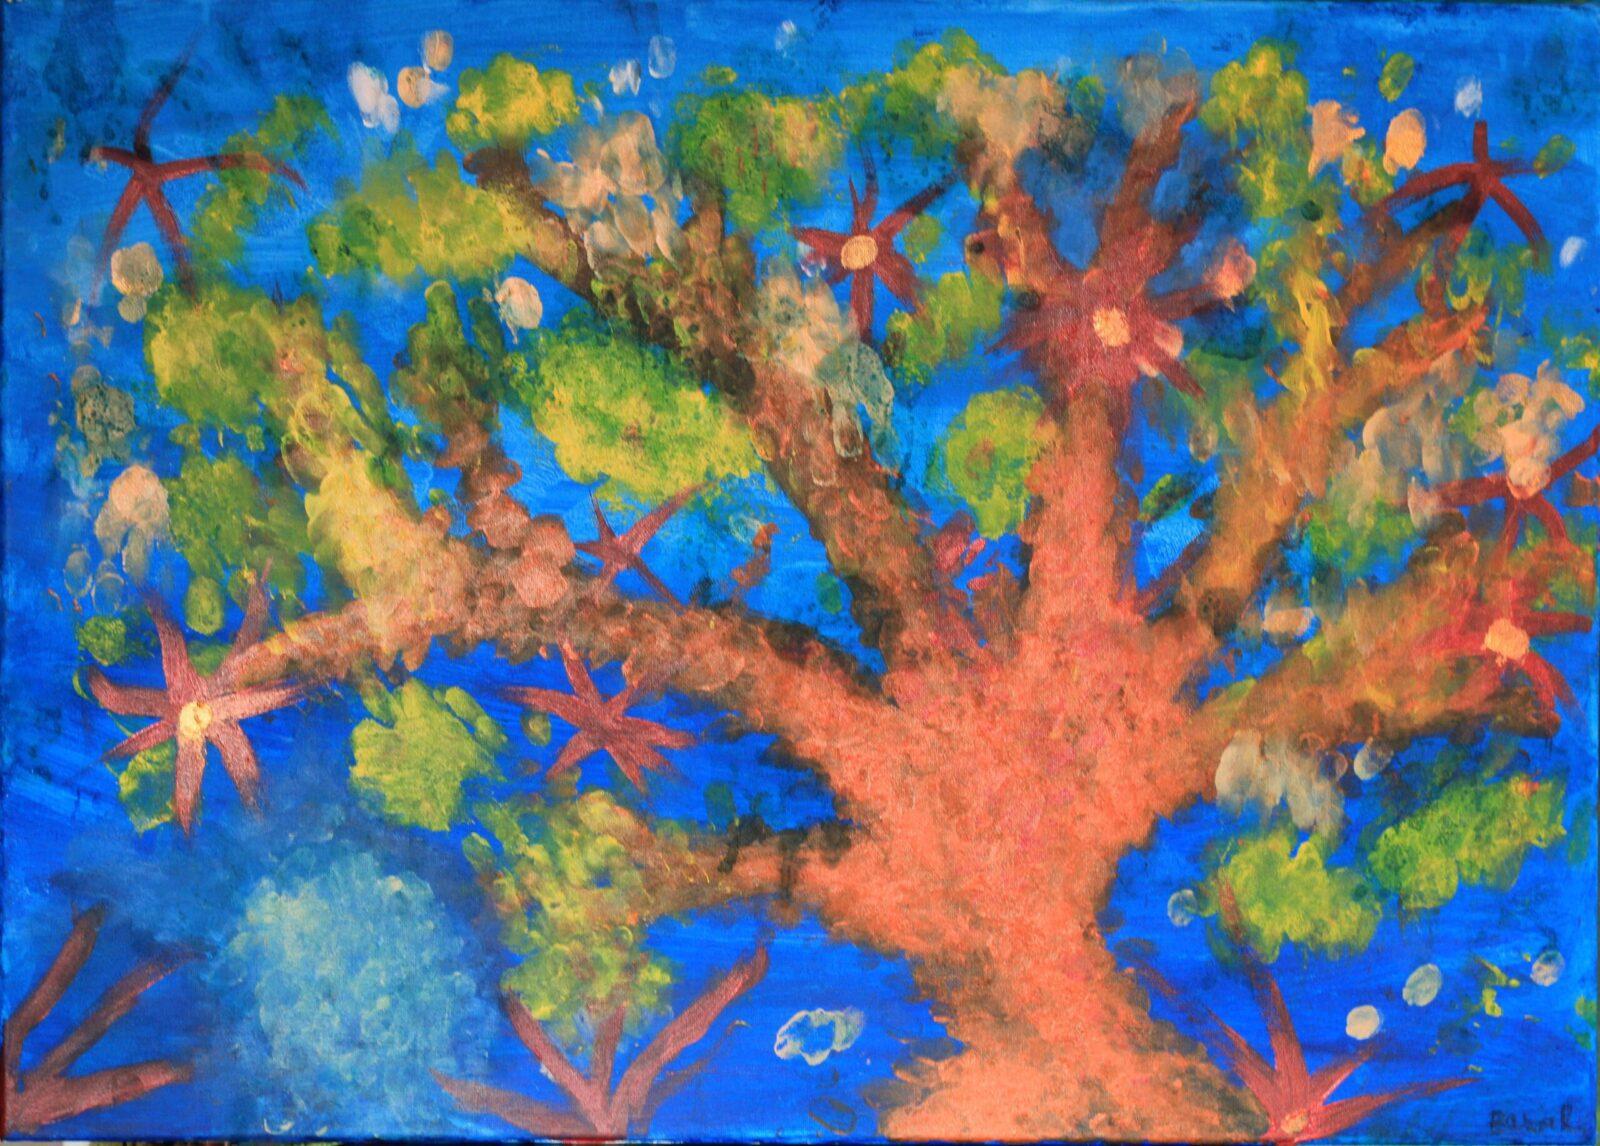 Błękitna impresja - Barbara Różycka